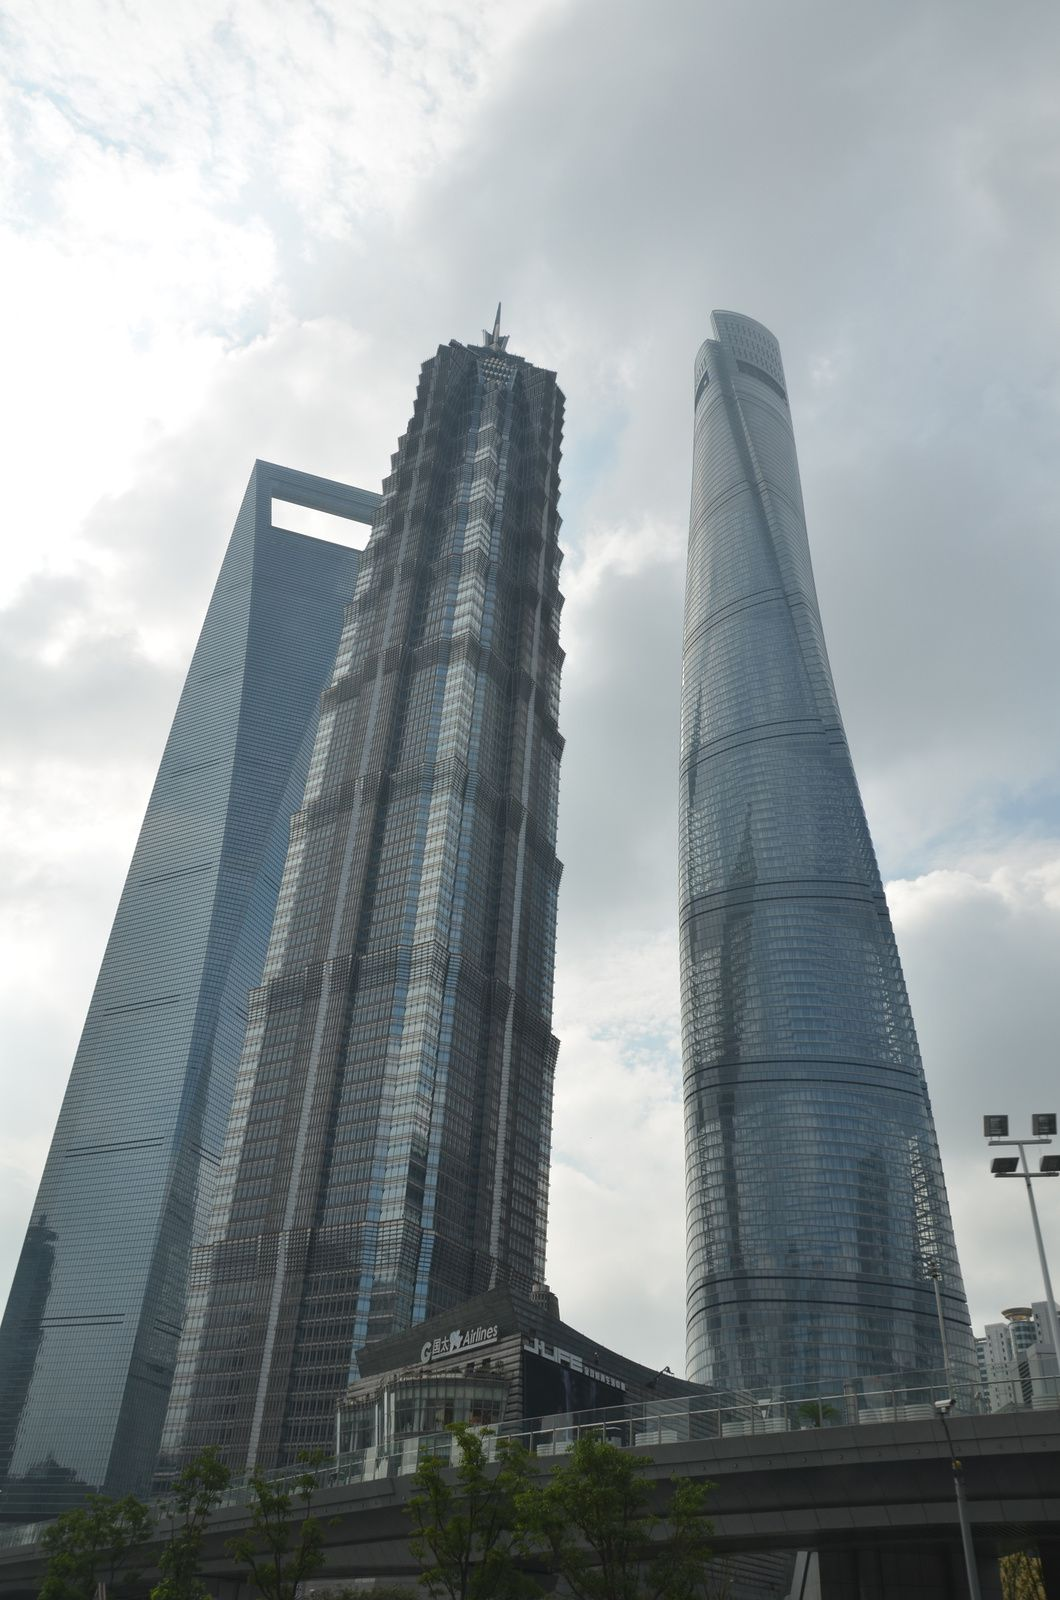 De gauche à droite : Shanghai World Financial Center (490 m), Jin Mao Tower (420 m) et Shanghai Tower (630 m)